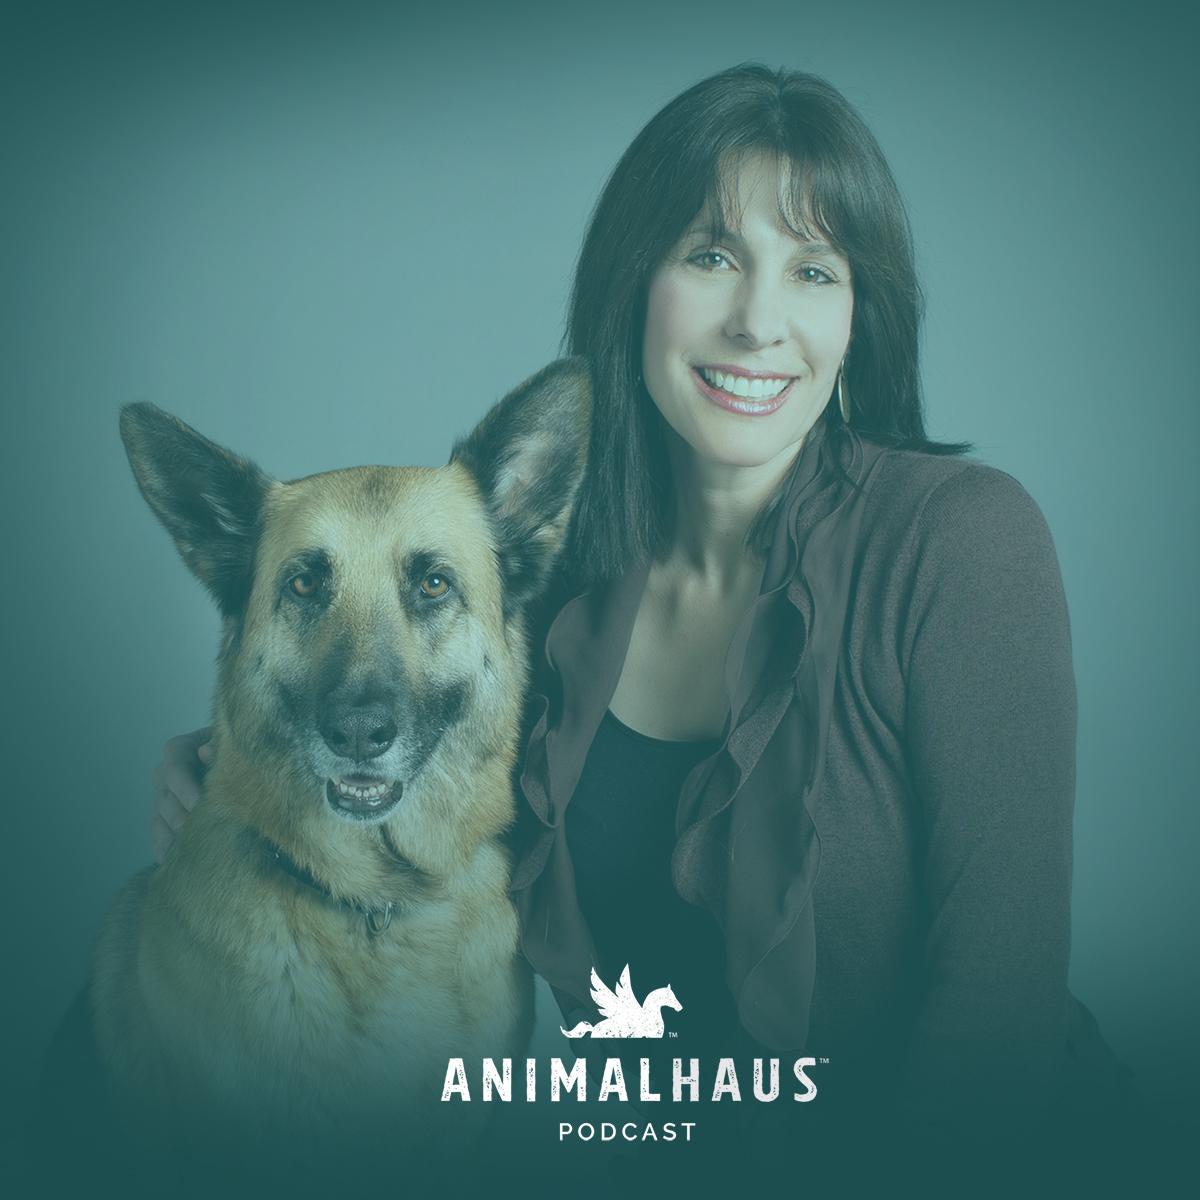 Carol Novello, Humane Society Silicon Valley President on the Animalhaus podcast